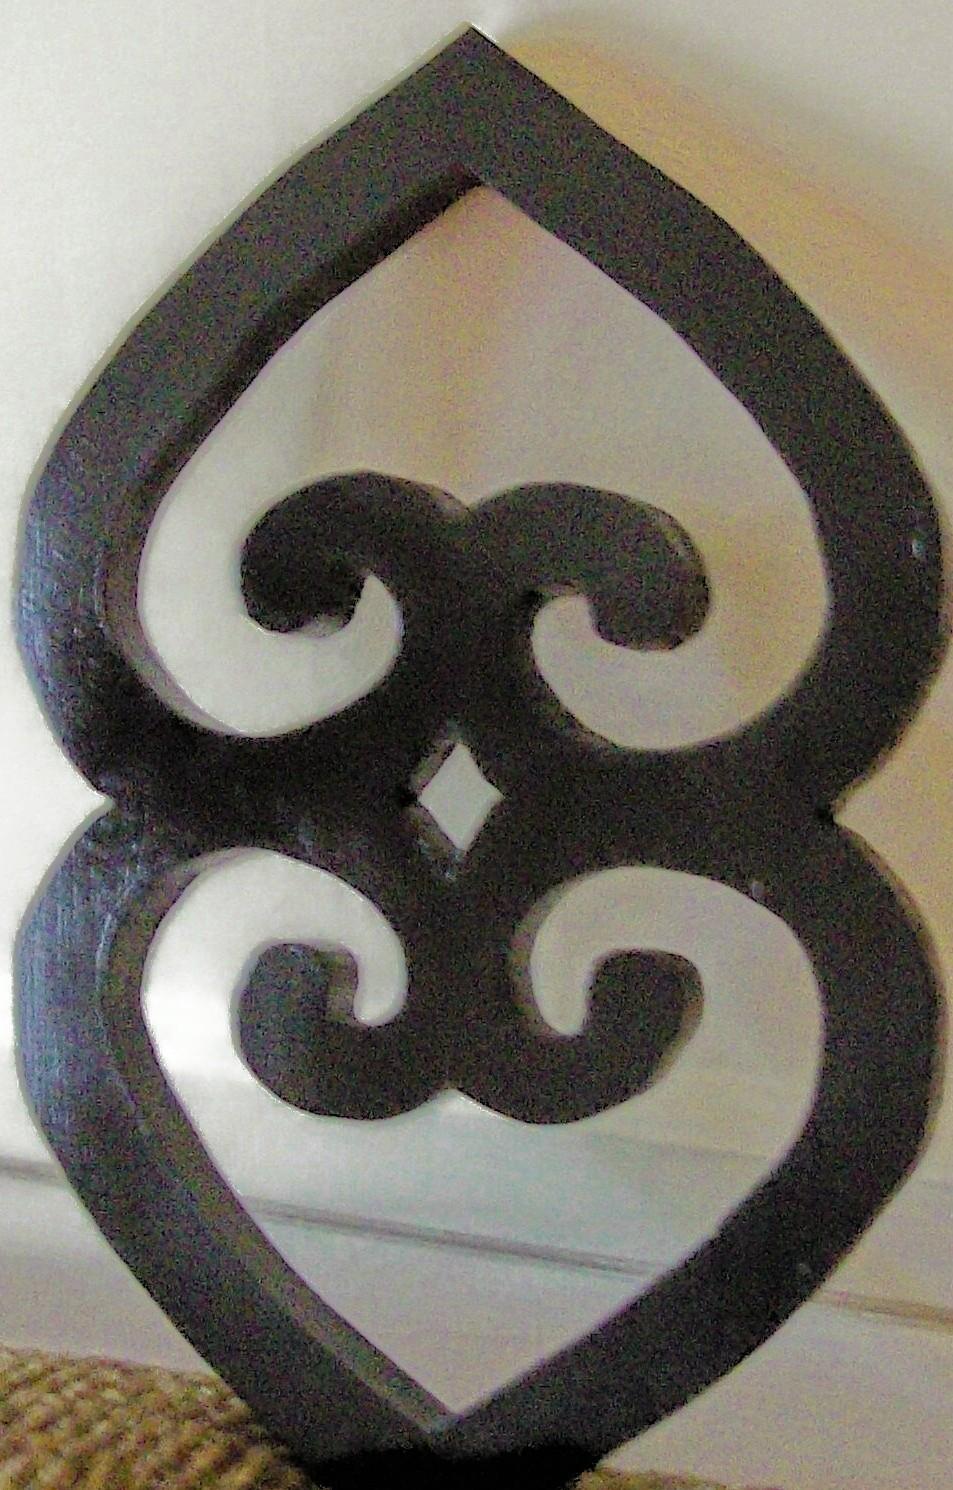 Bbwritez With Stephenbonsu Culture History Of Adinkra Symbol